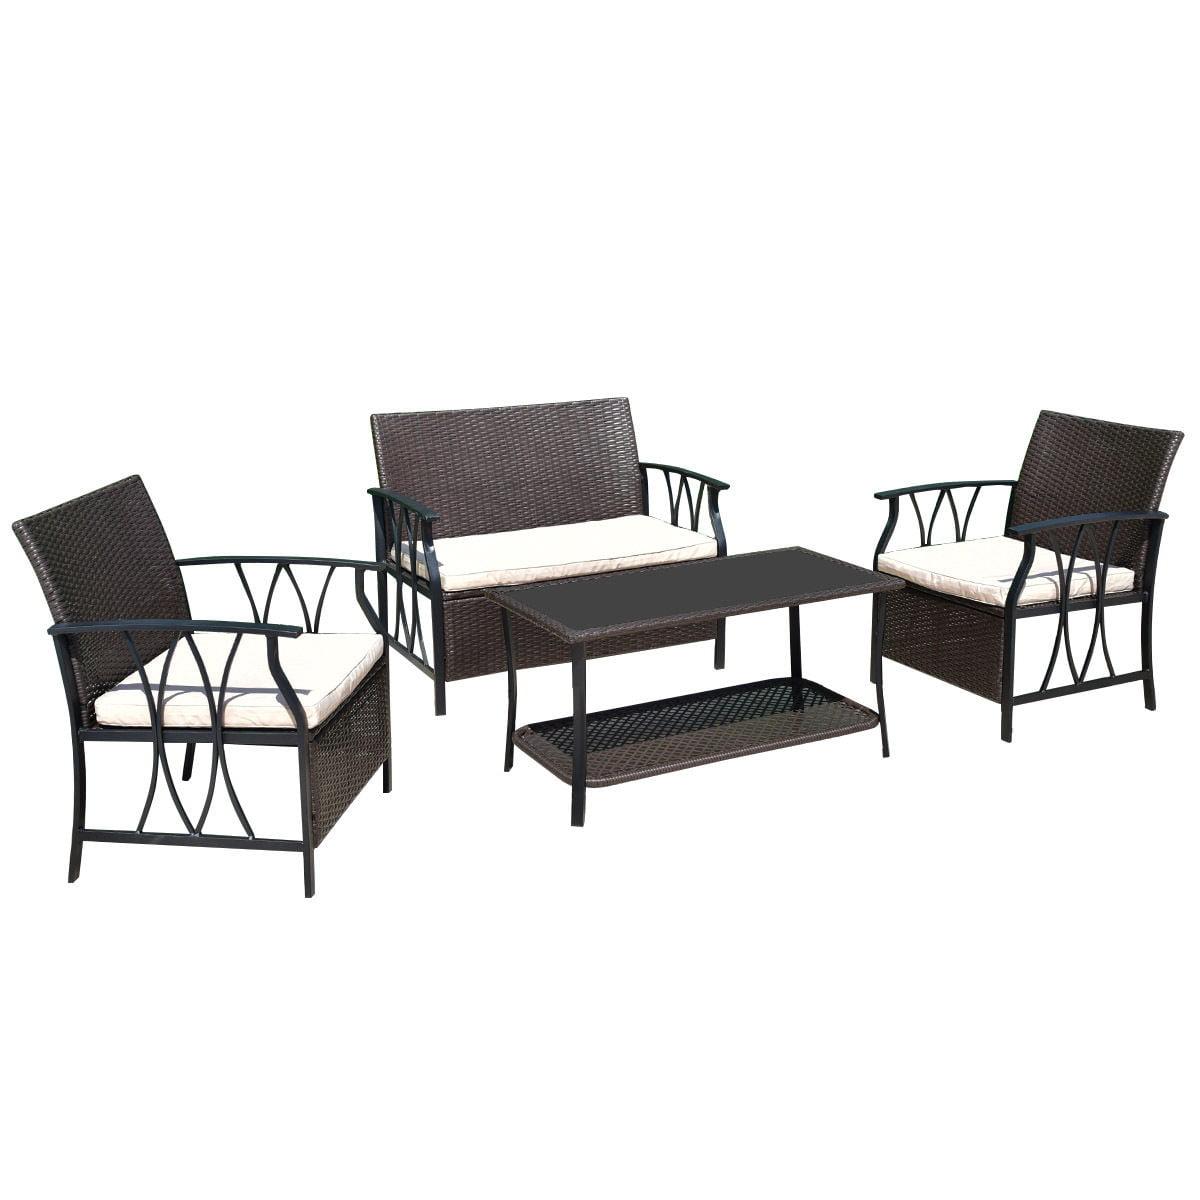 Gymax 4PC Rattan Wicker Furniture Set Cushion Outdoor Patio Garden Deck - image 5 de 5